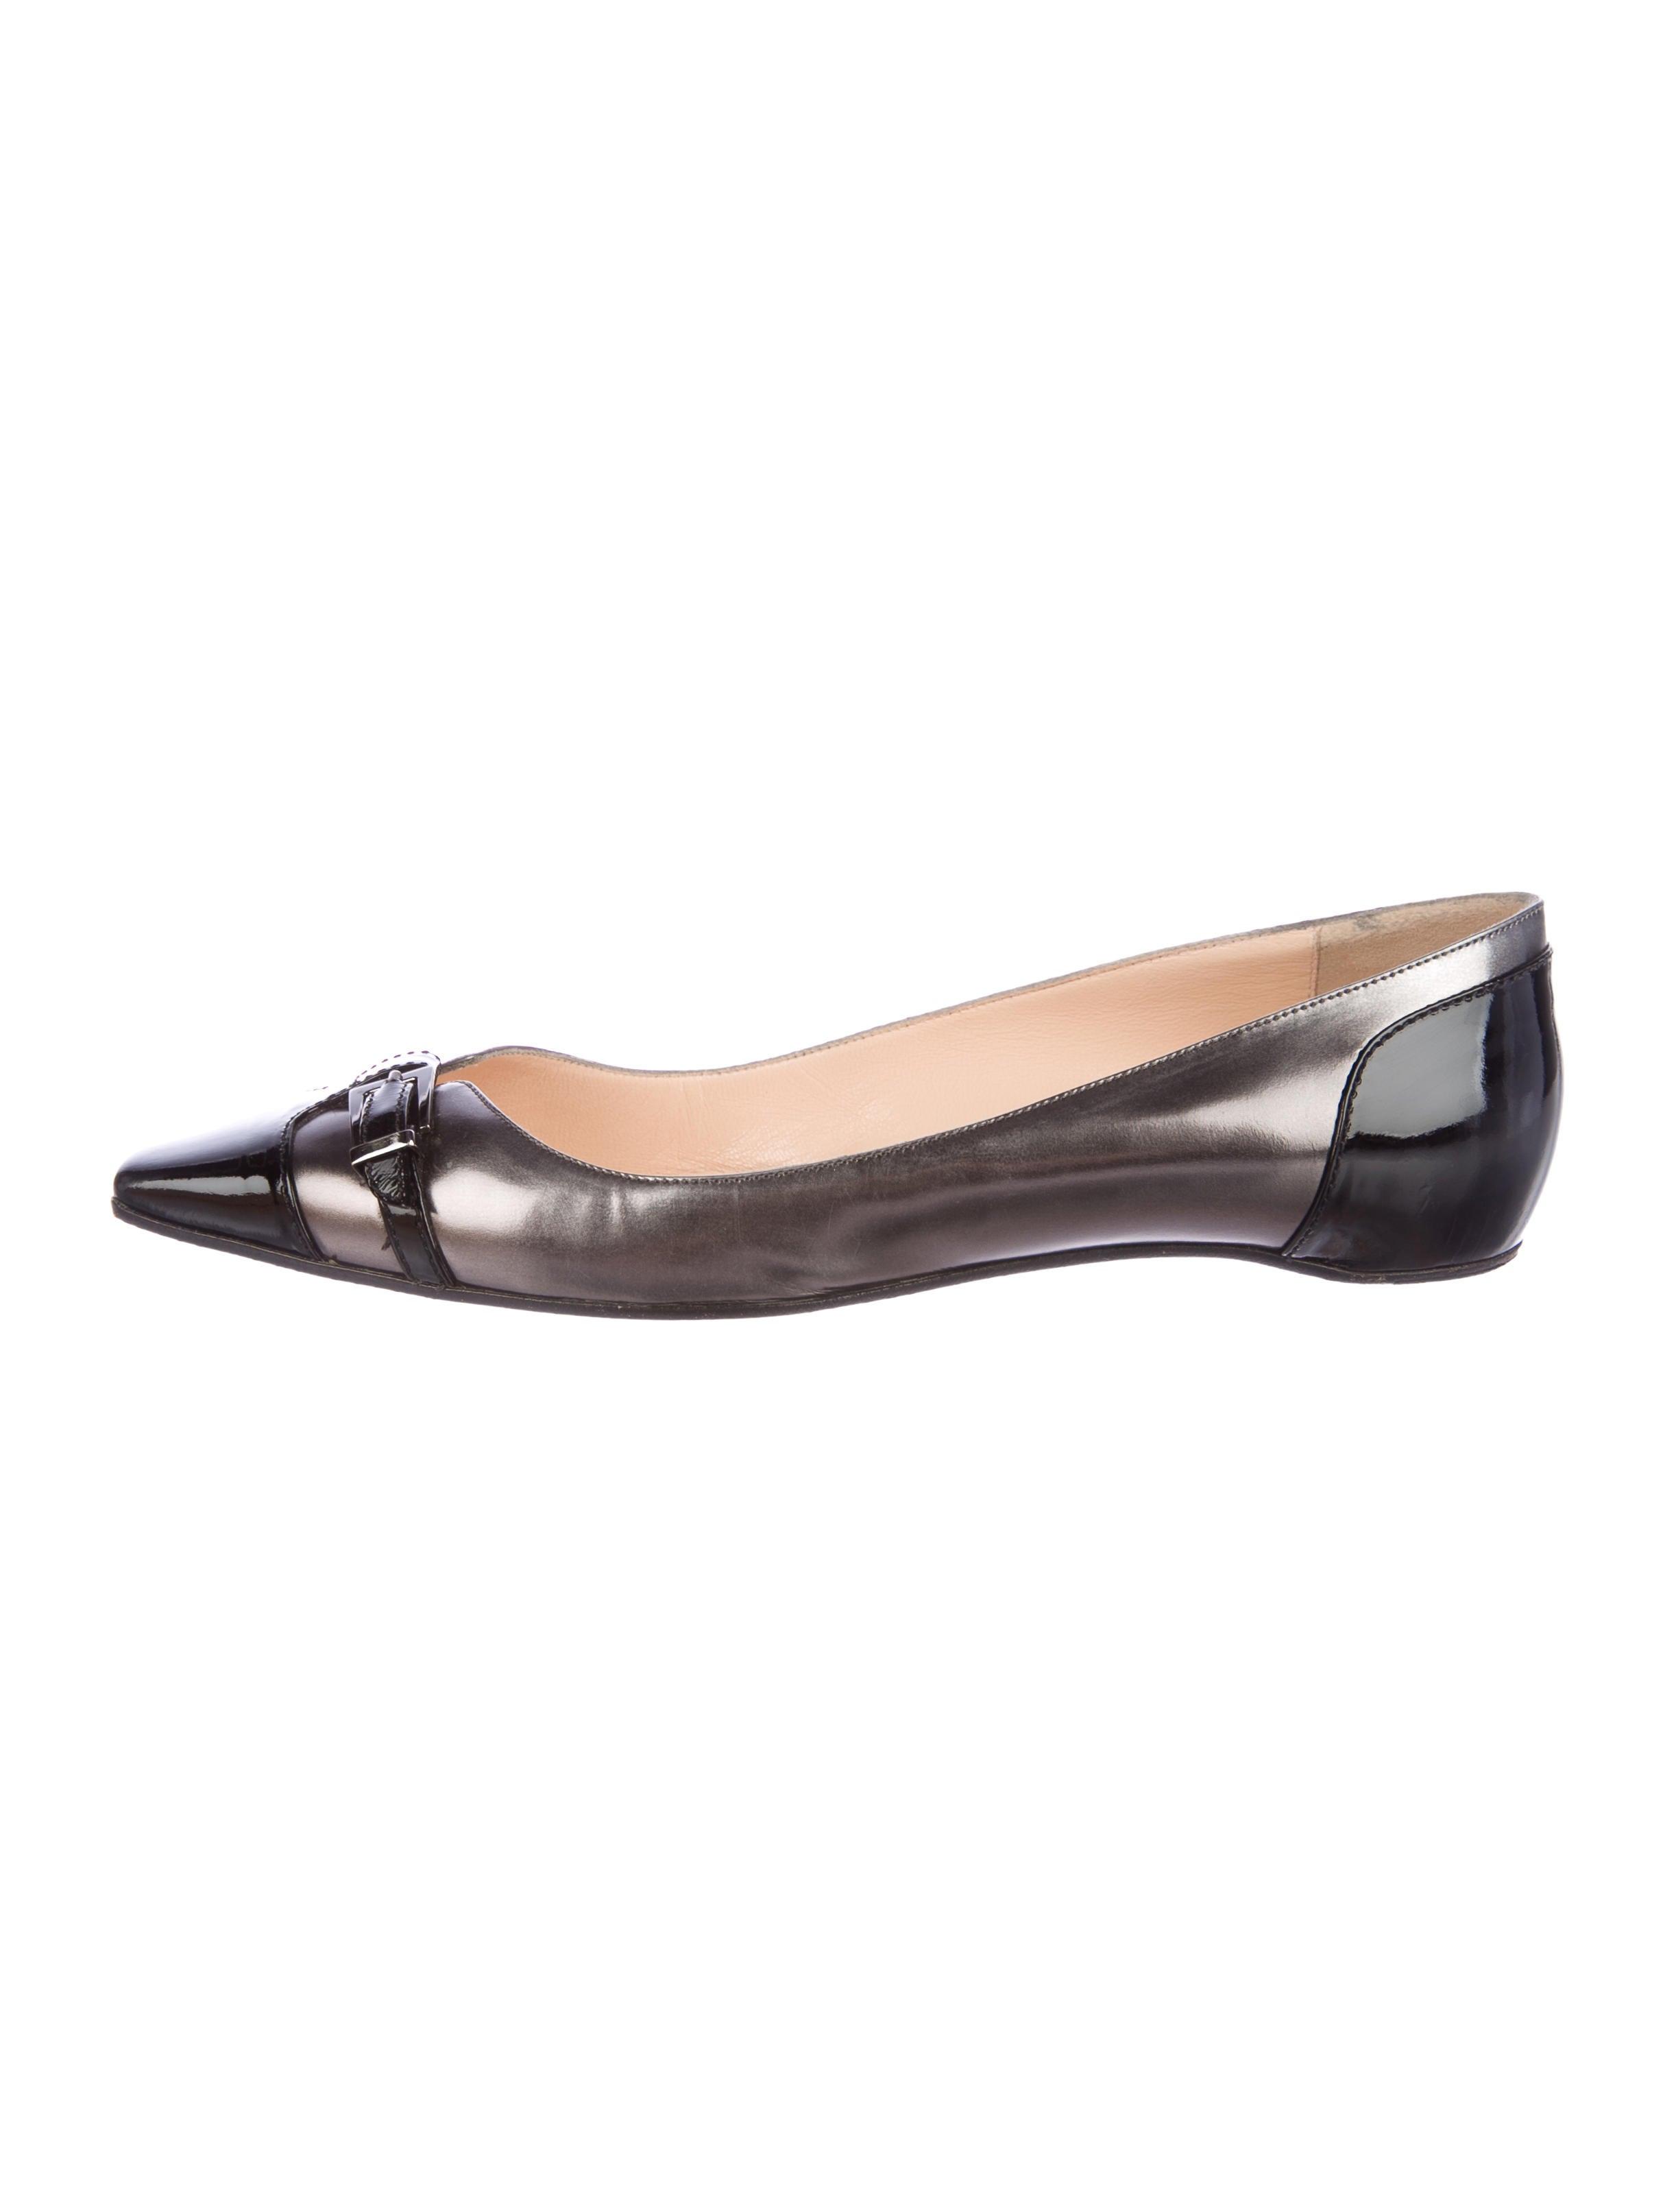 Christian Louboutin Serafina Square-Toe Flats discount shopping online E9e3cXvgsC